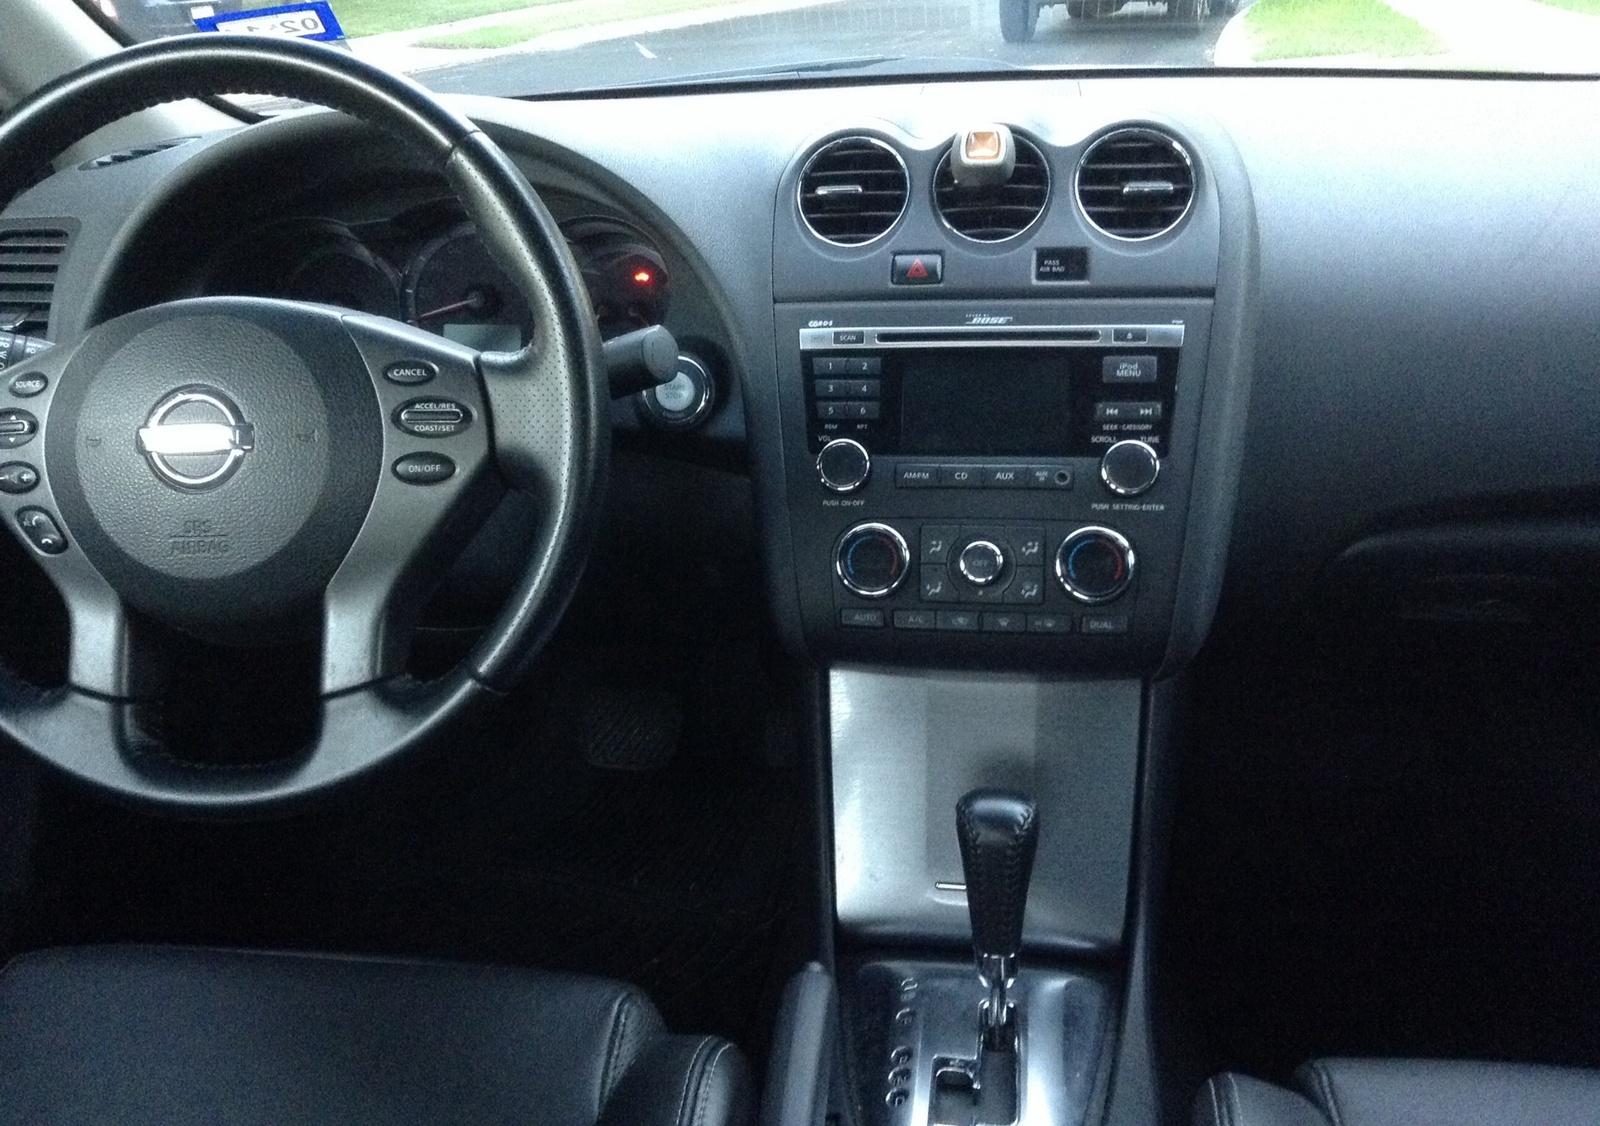 Nissan Altima 2013 Interior 2013 Nissan Altima Interior 2017 2018 Best Cars Reviews